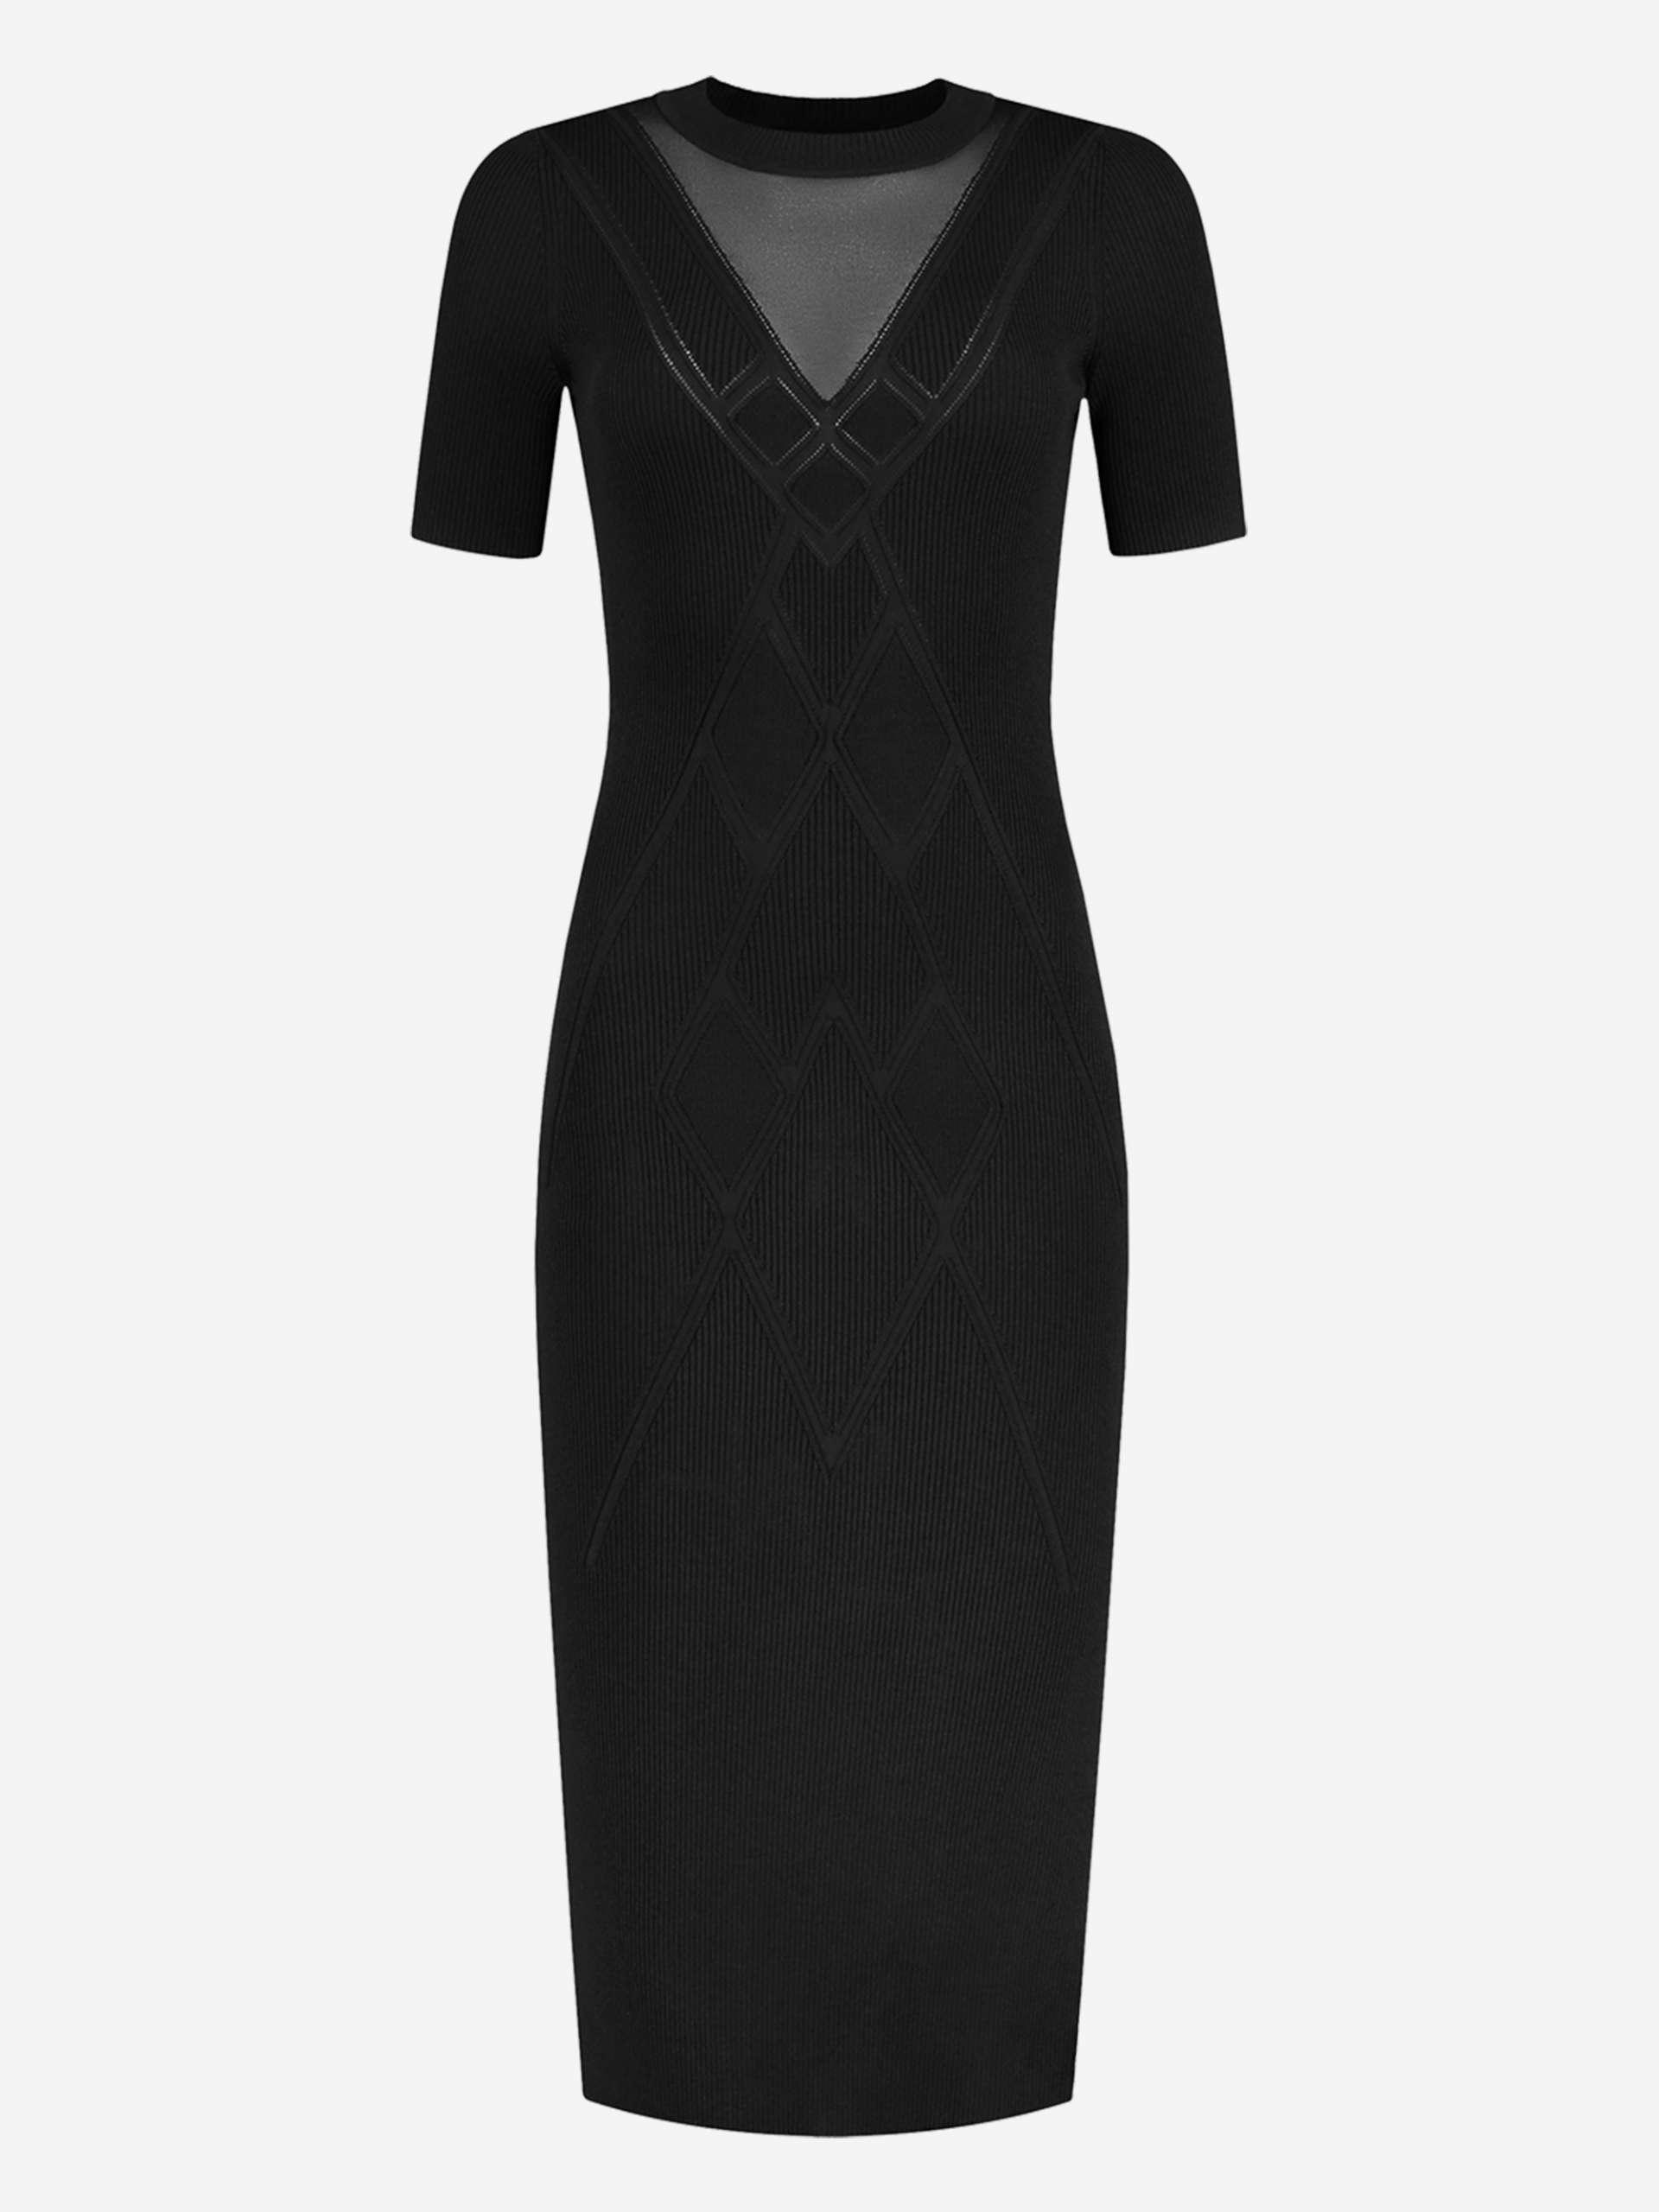 Kate Moss X Nikkie Gigi Dress in Zwart